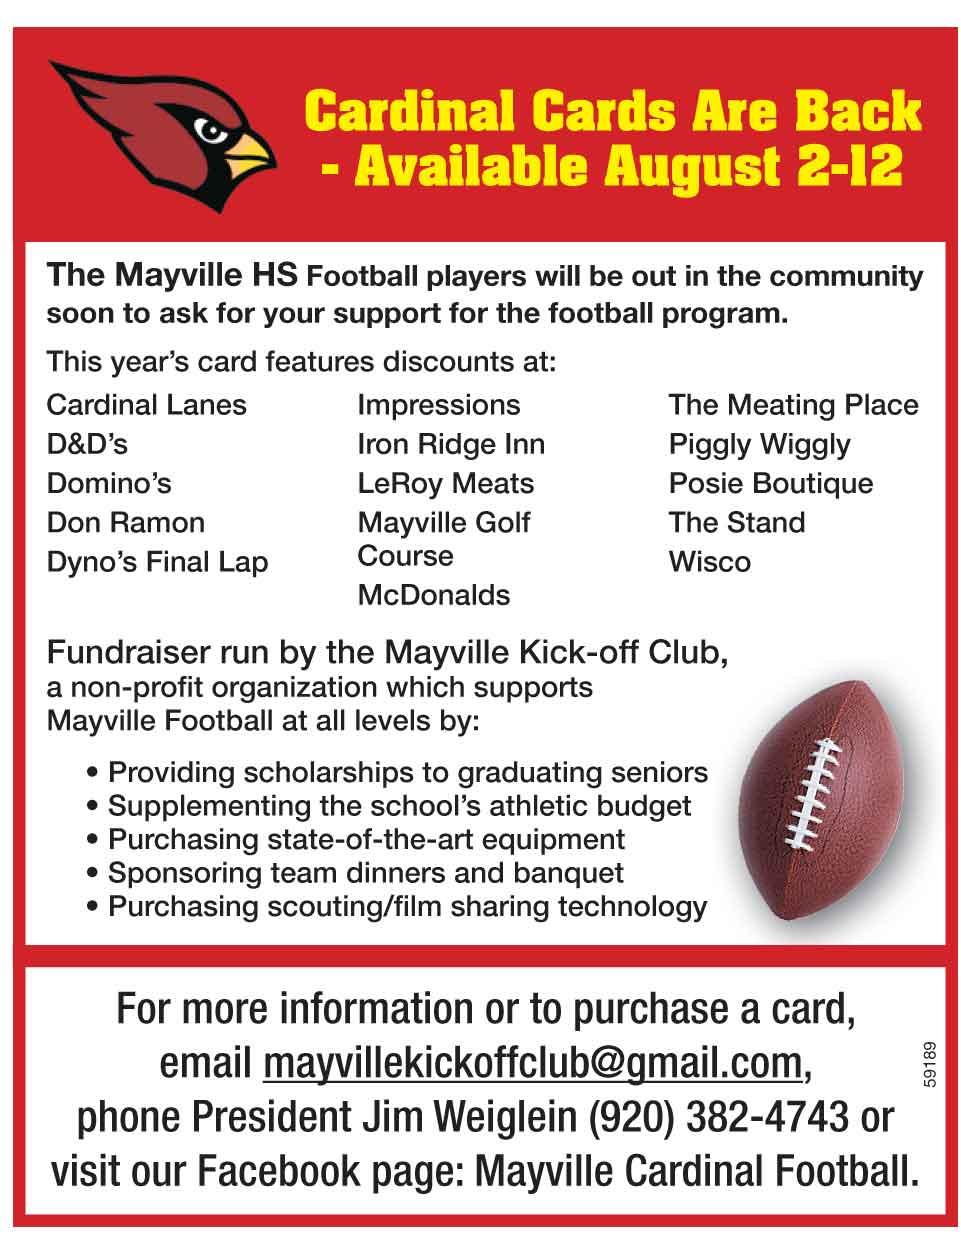 Mayville Cardinal Football